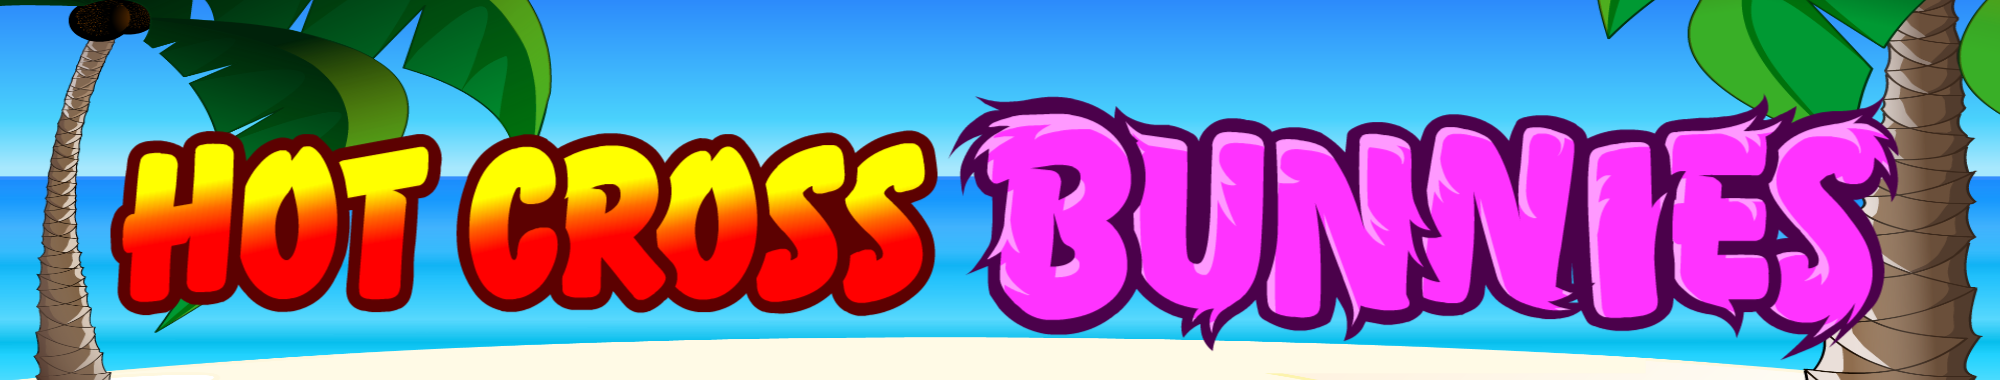 play hot cross bunnies slot